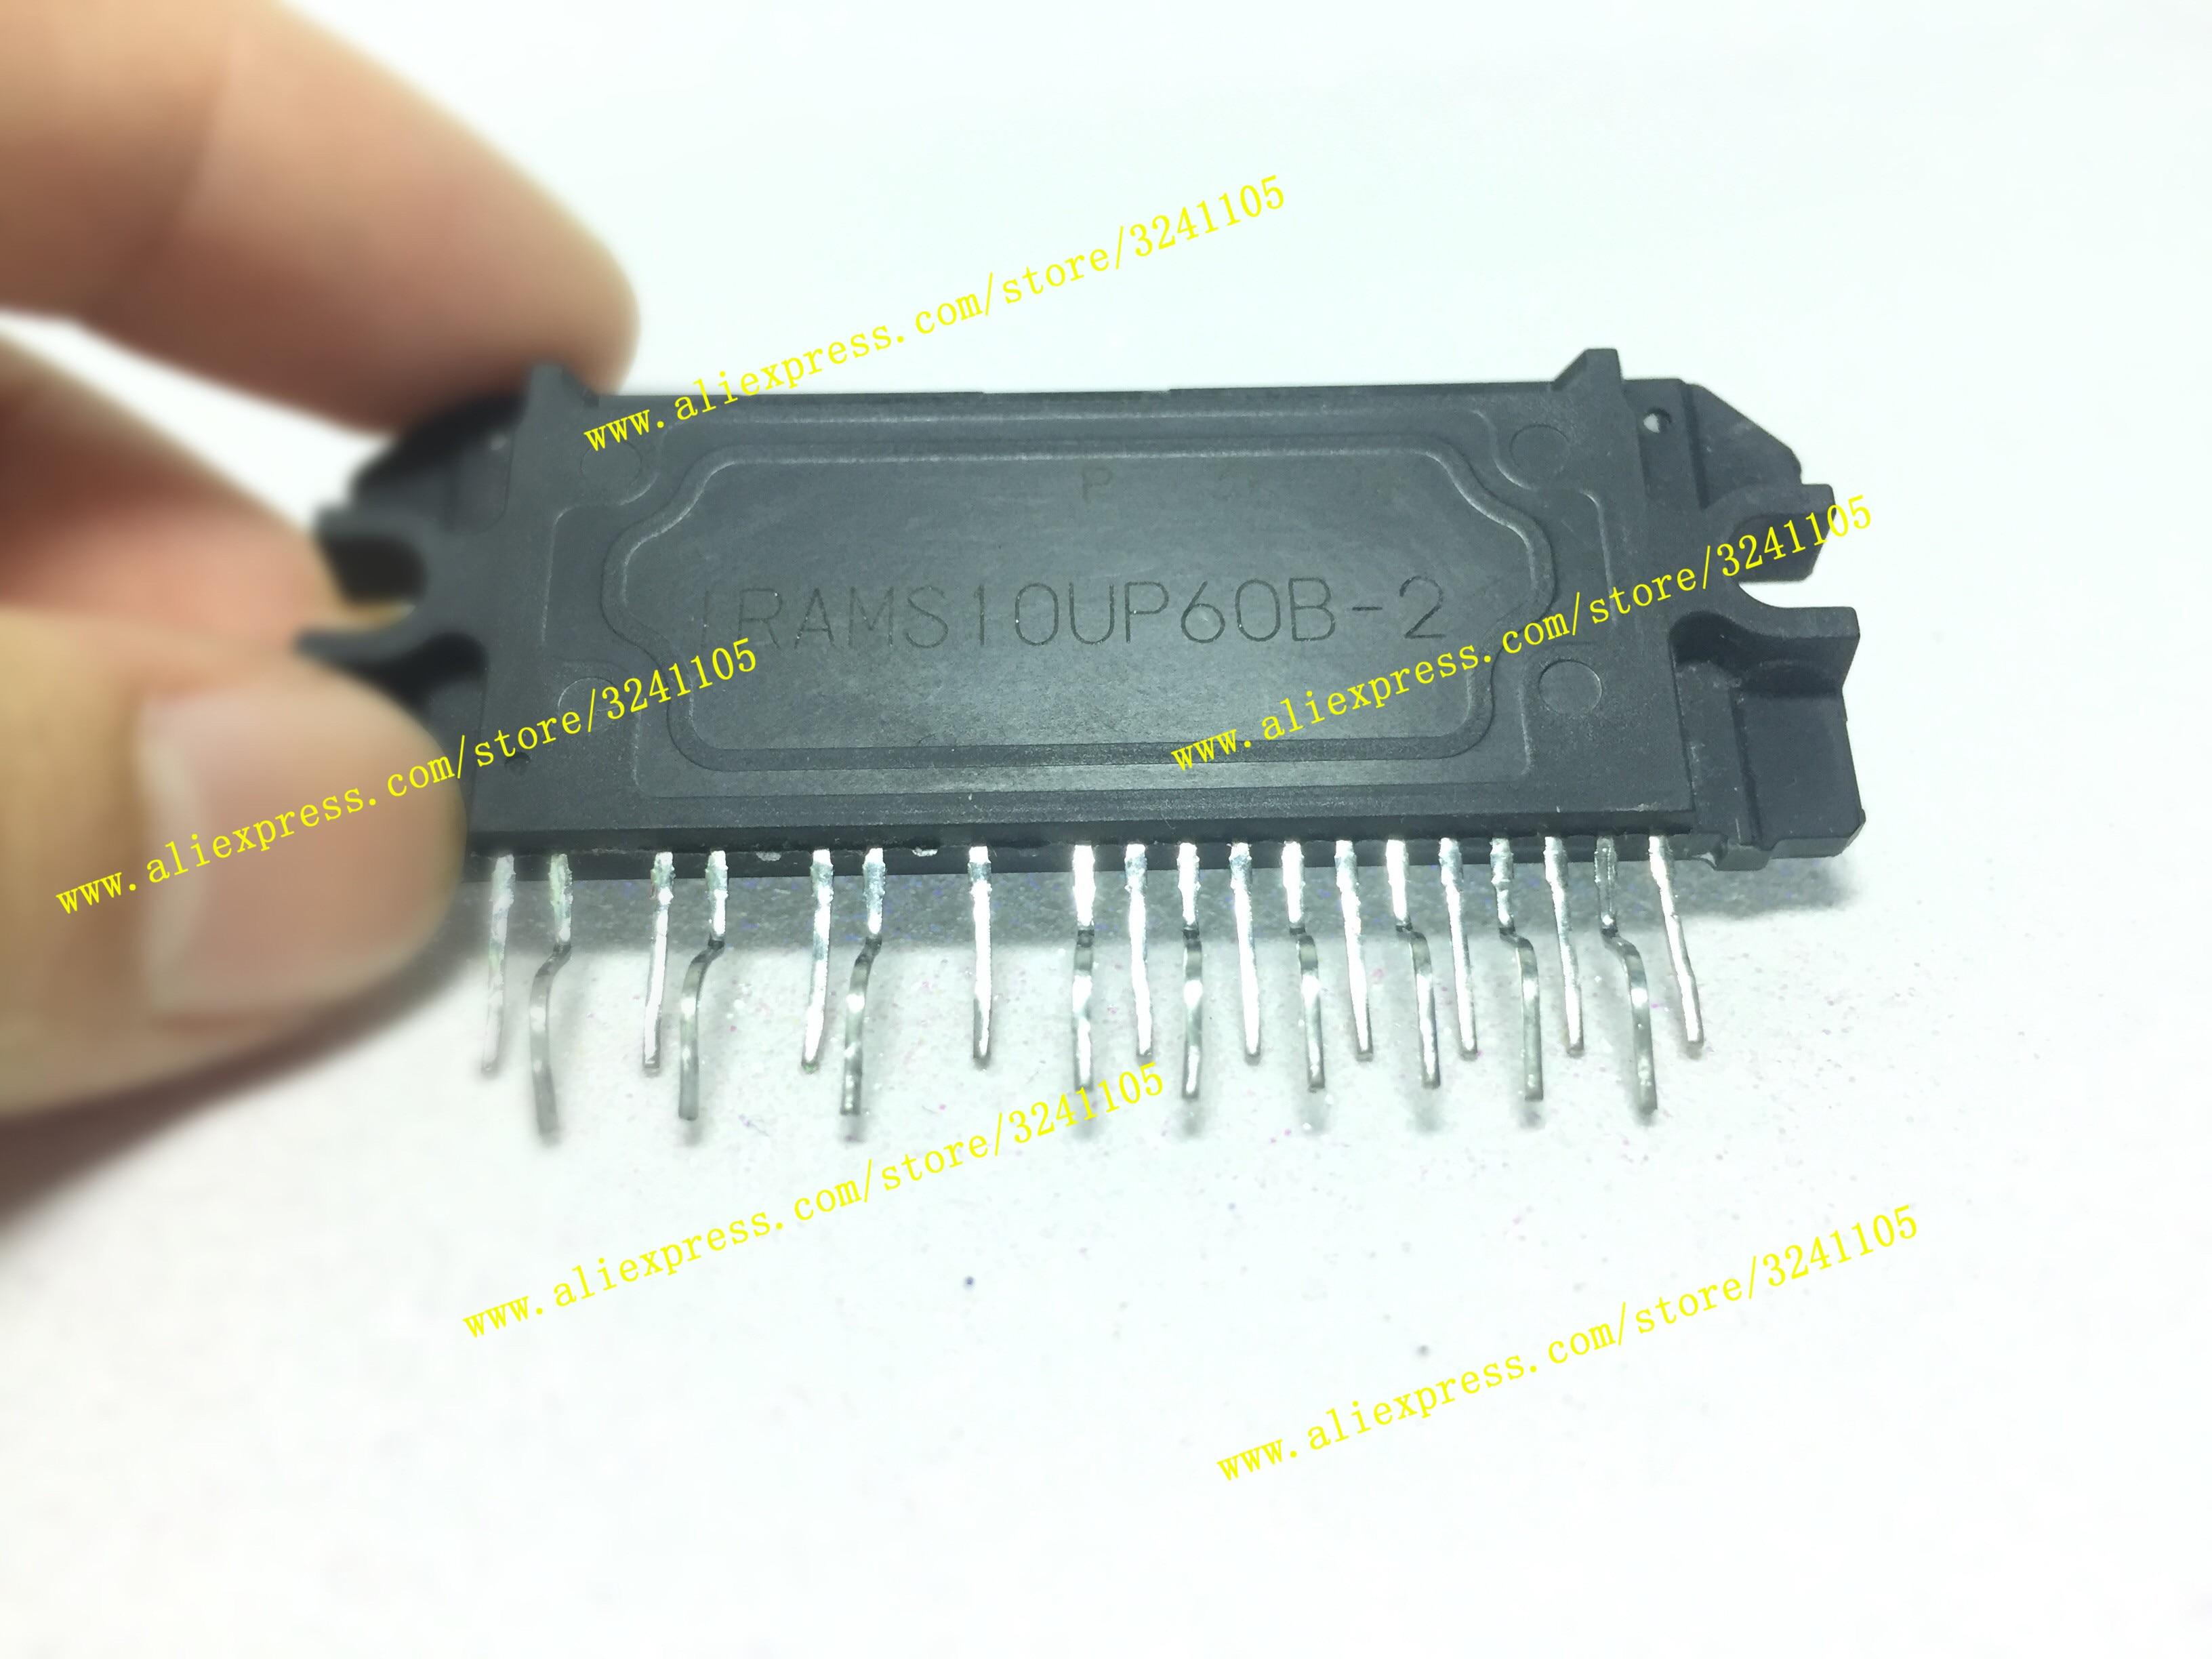 Free Shipping New IRAMS10UP60B-2 Module